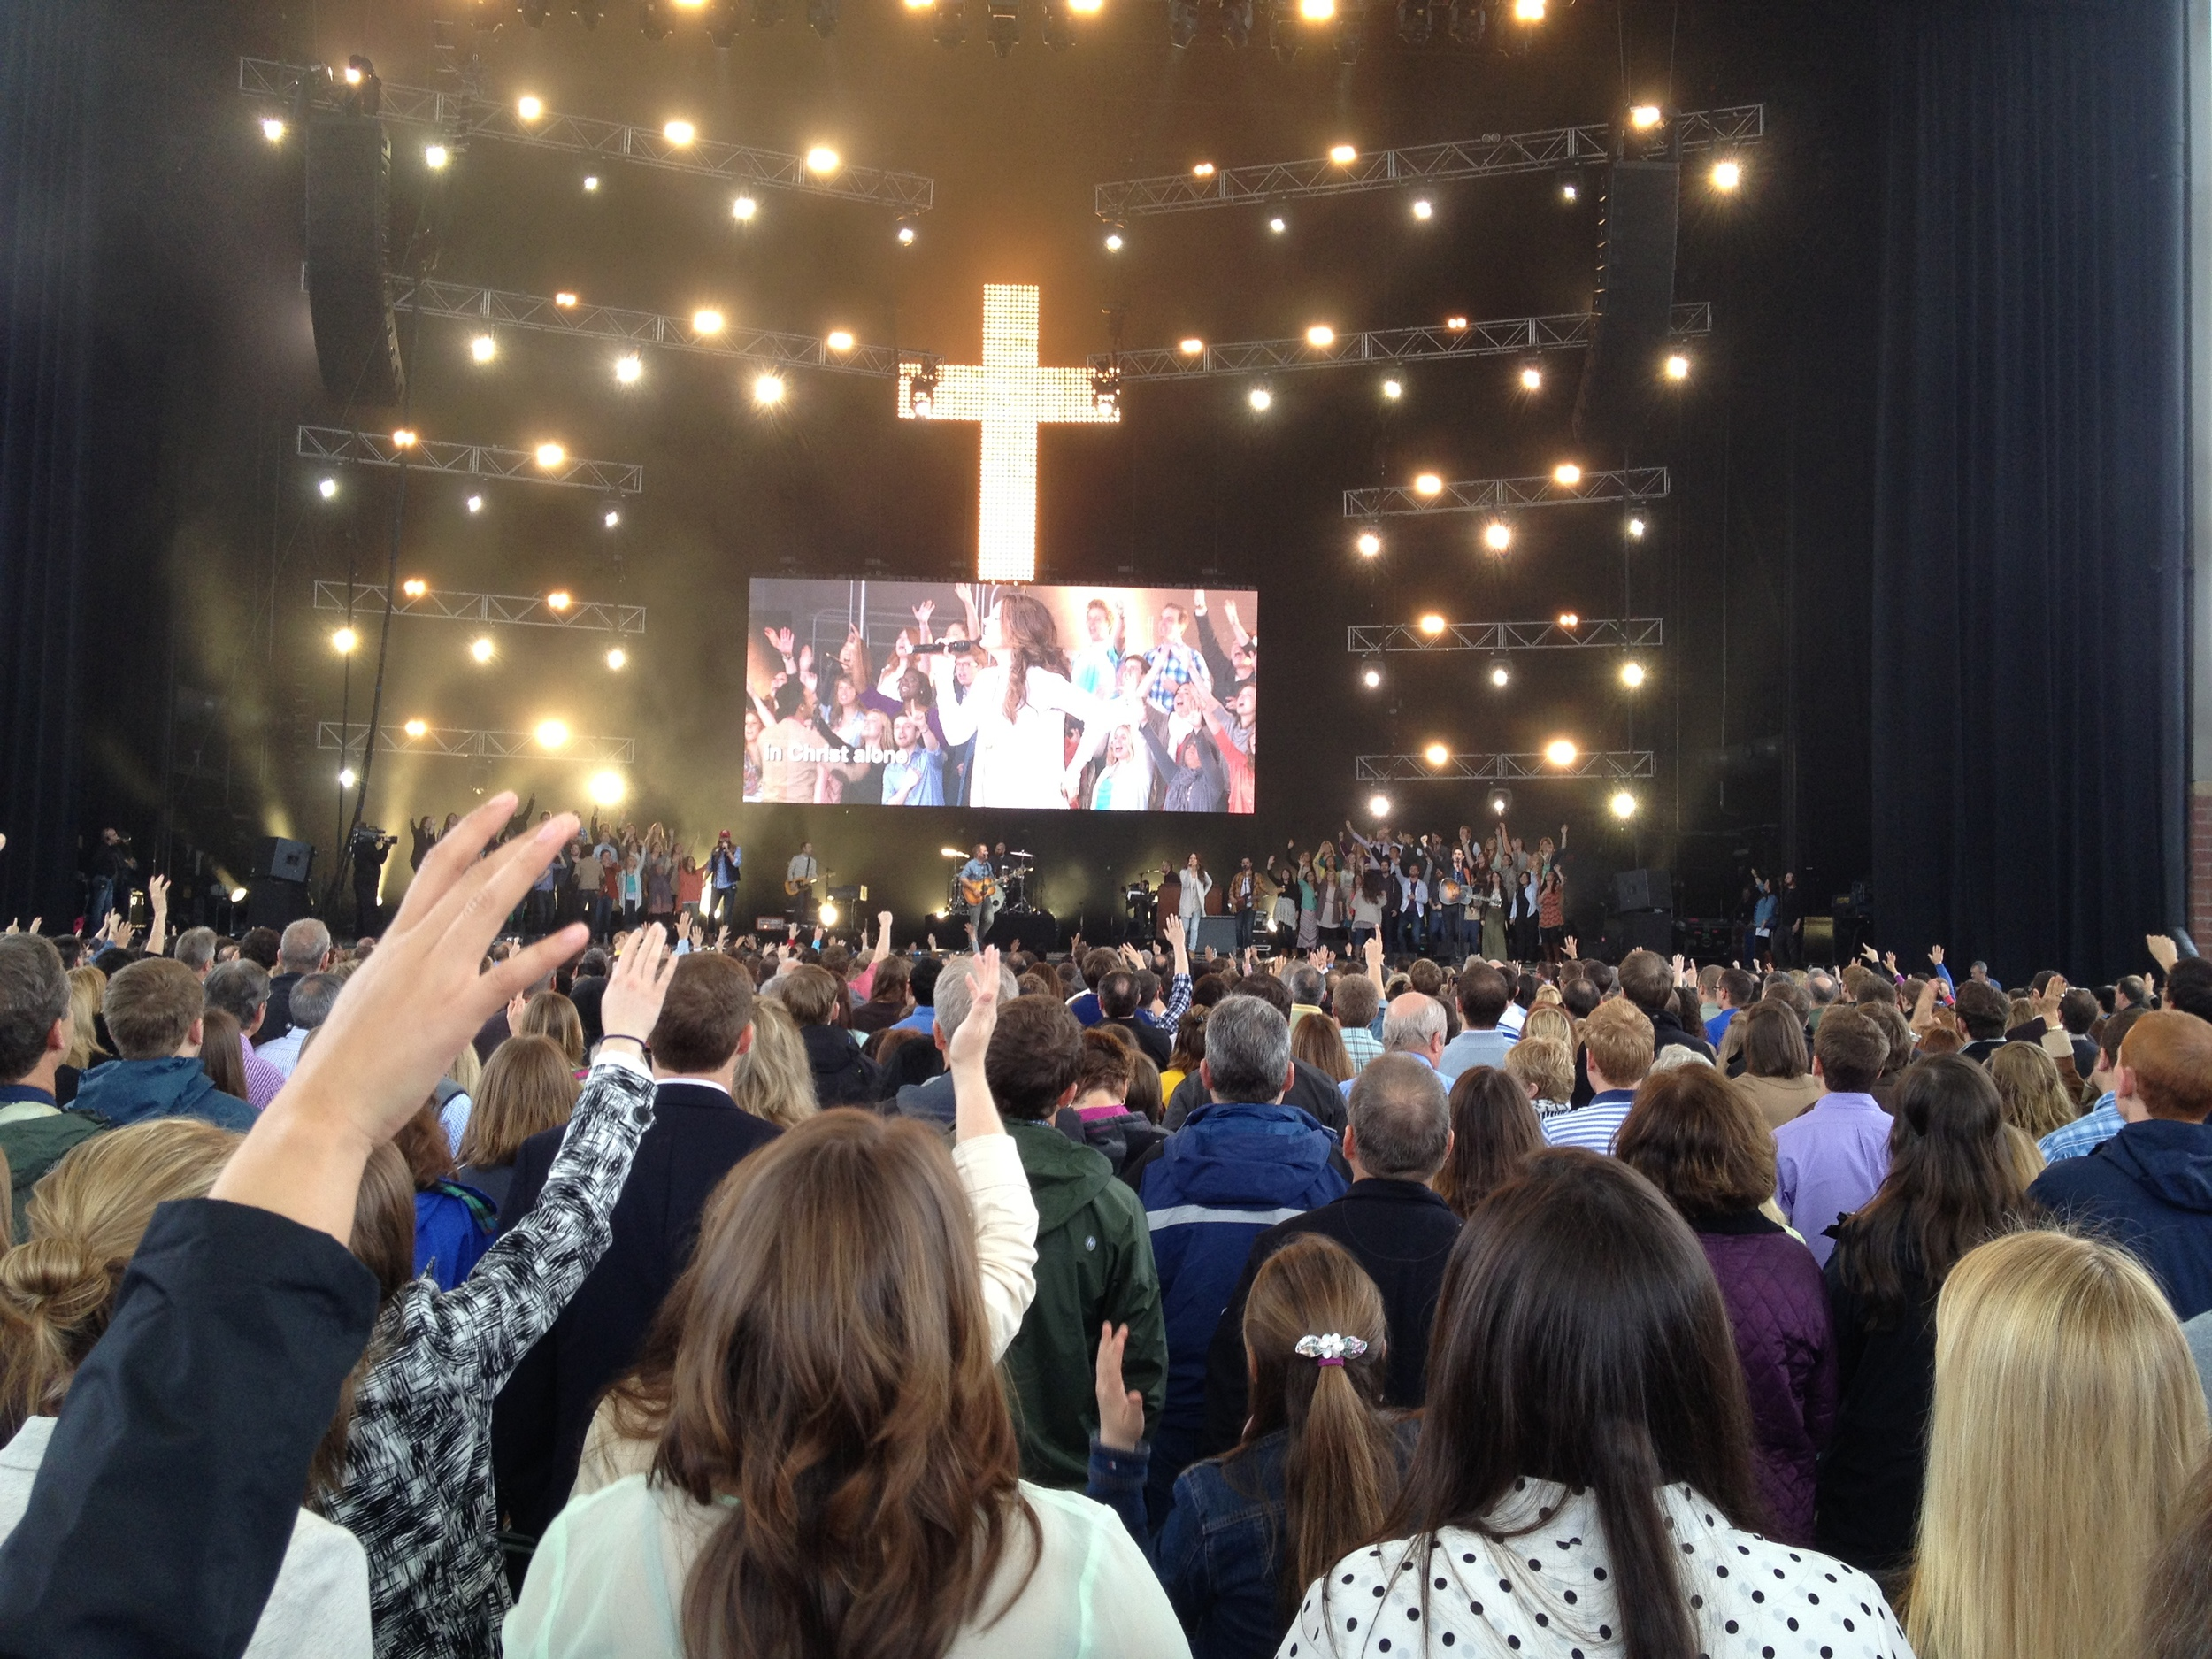 Easter worship at Louis Giglio's church in Atlanta